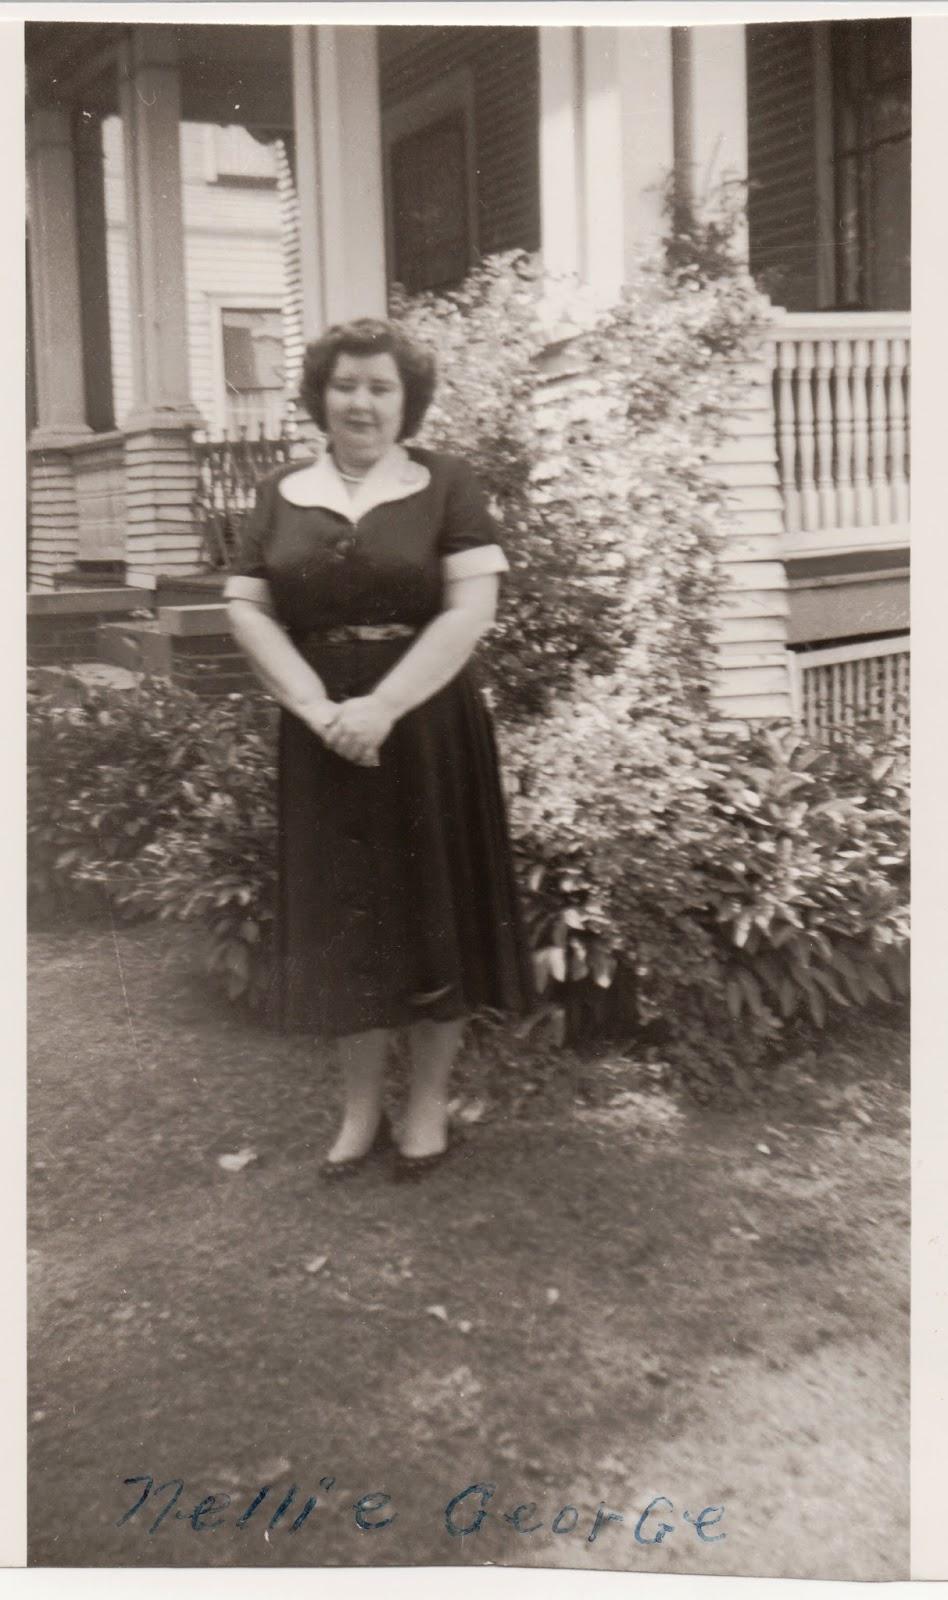 Nellie George Collins